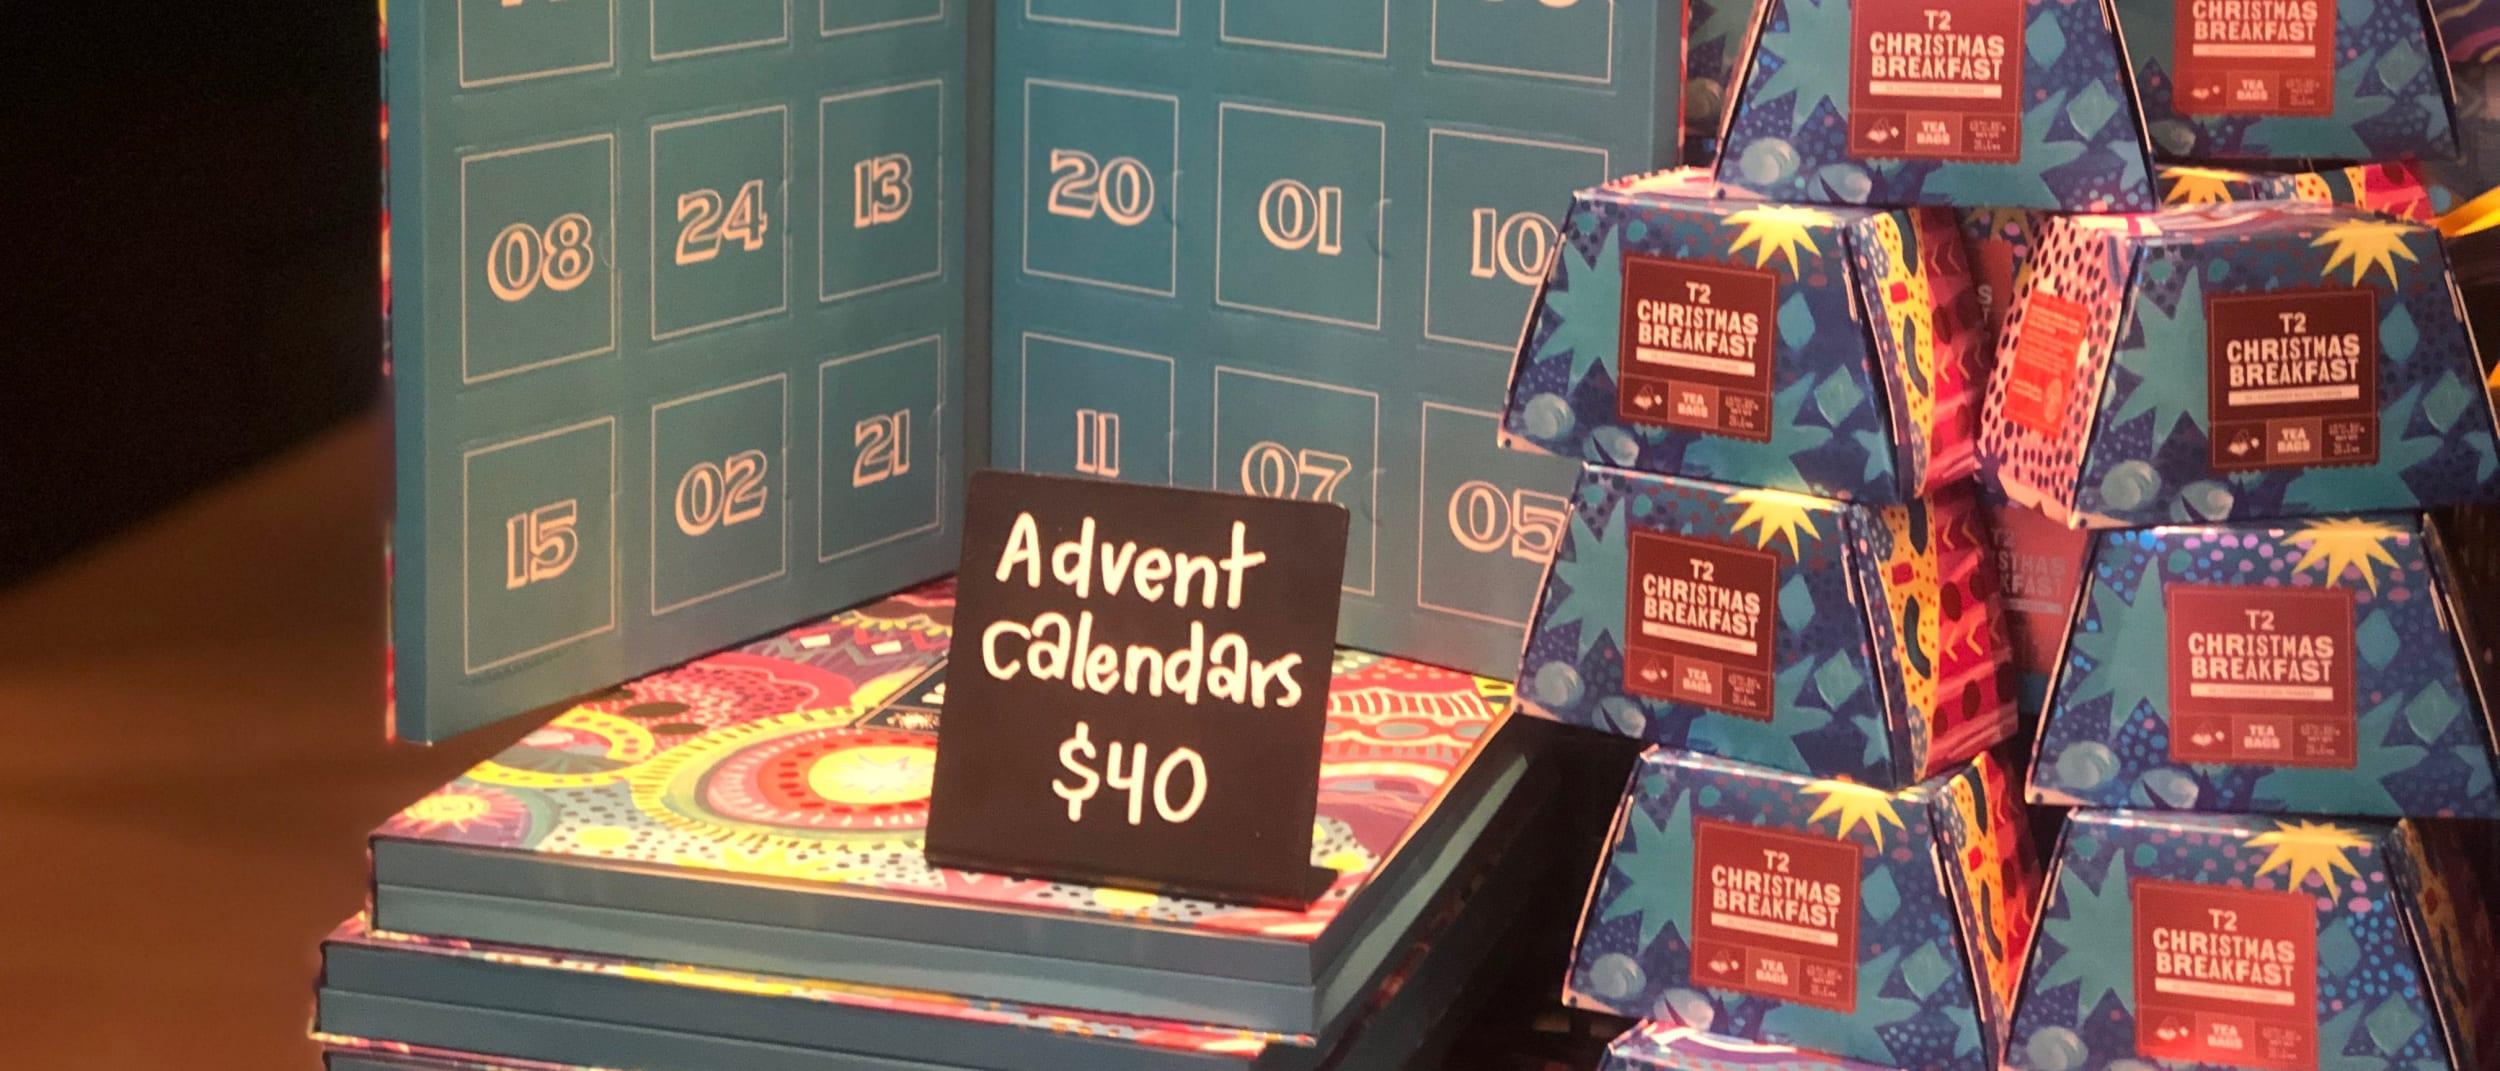 Our advent calendar top picks!